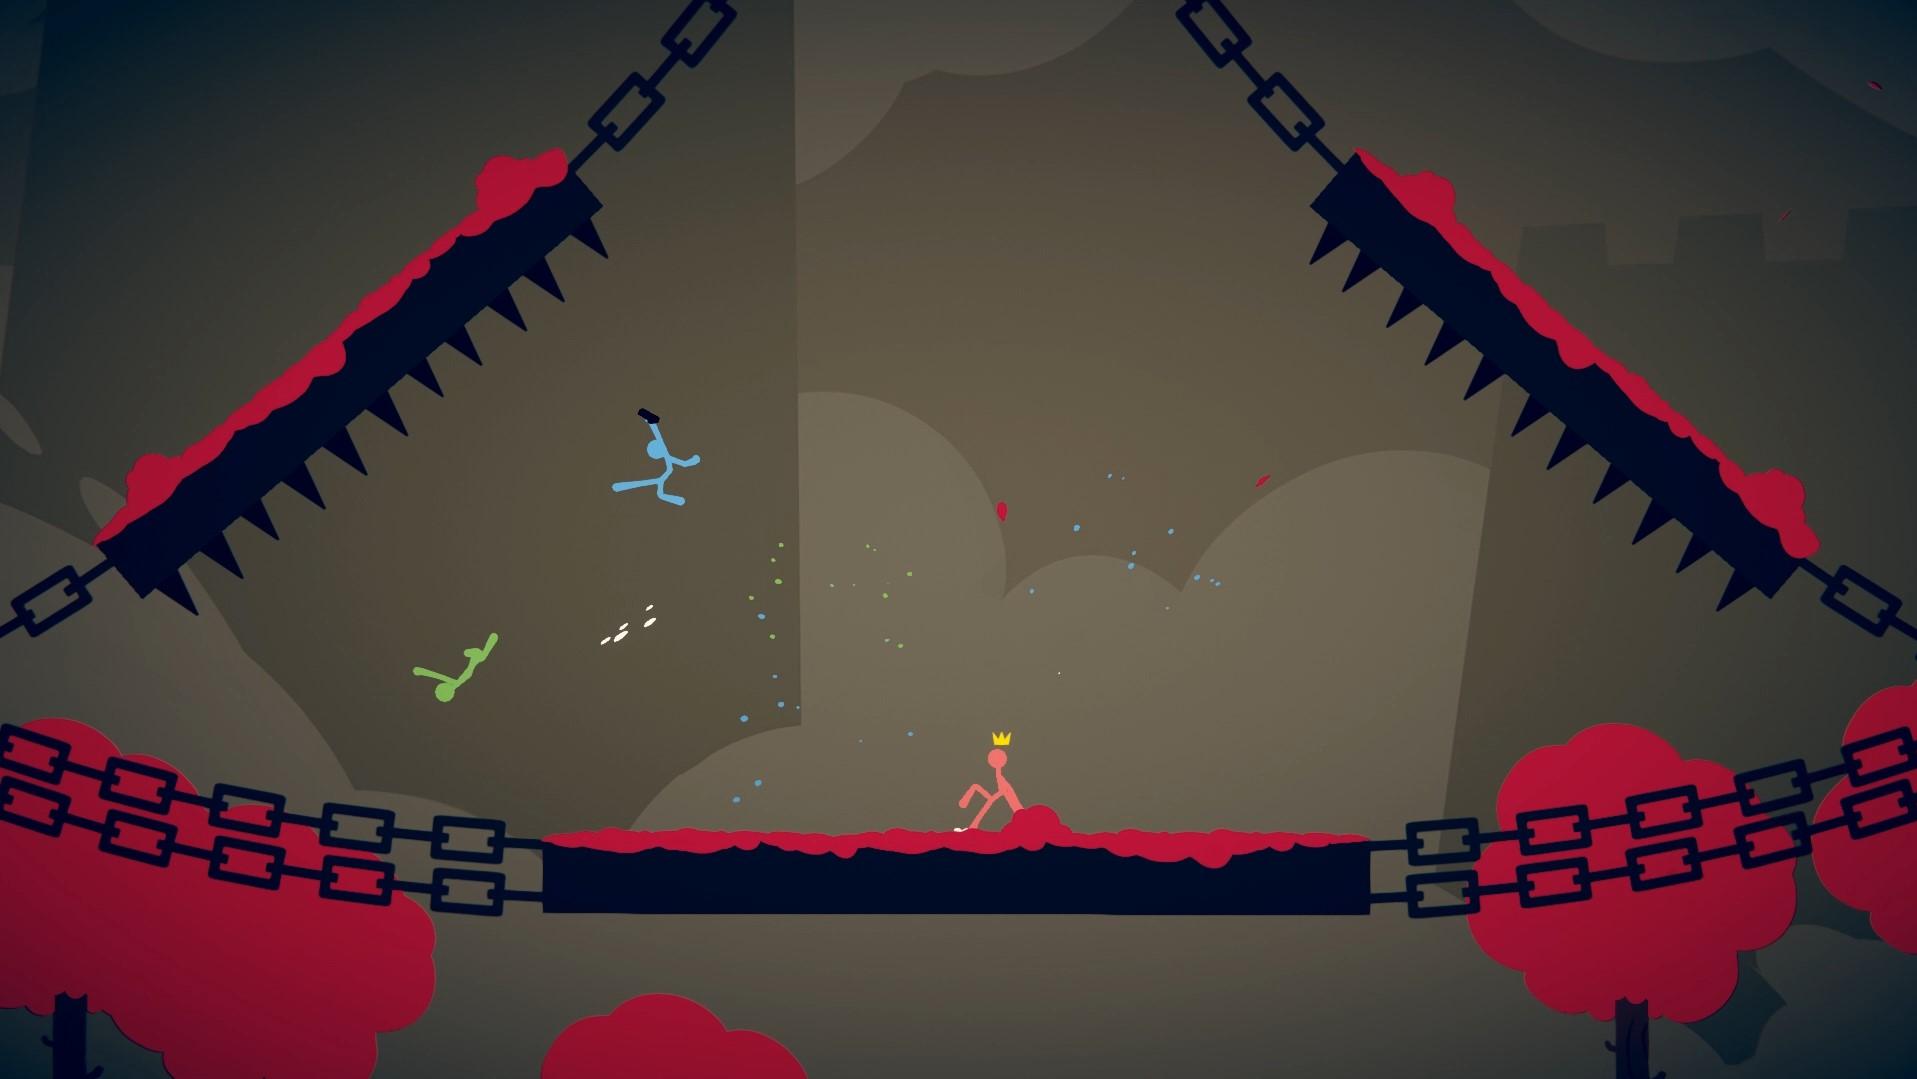 Скриншоты к Stick Fight: The Game (1.2.01) полная версия